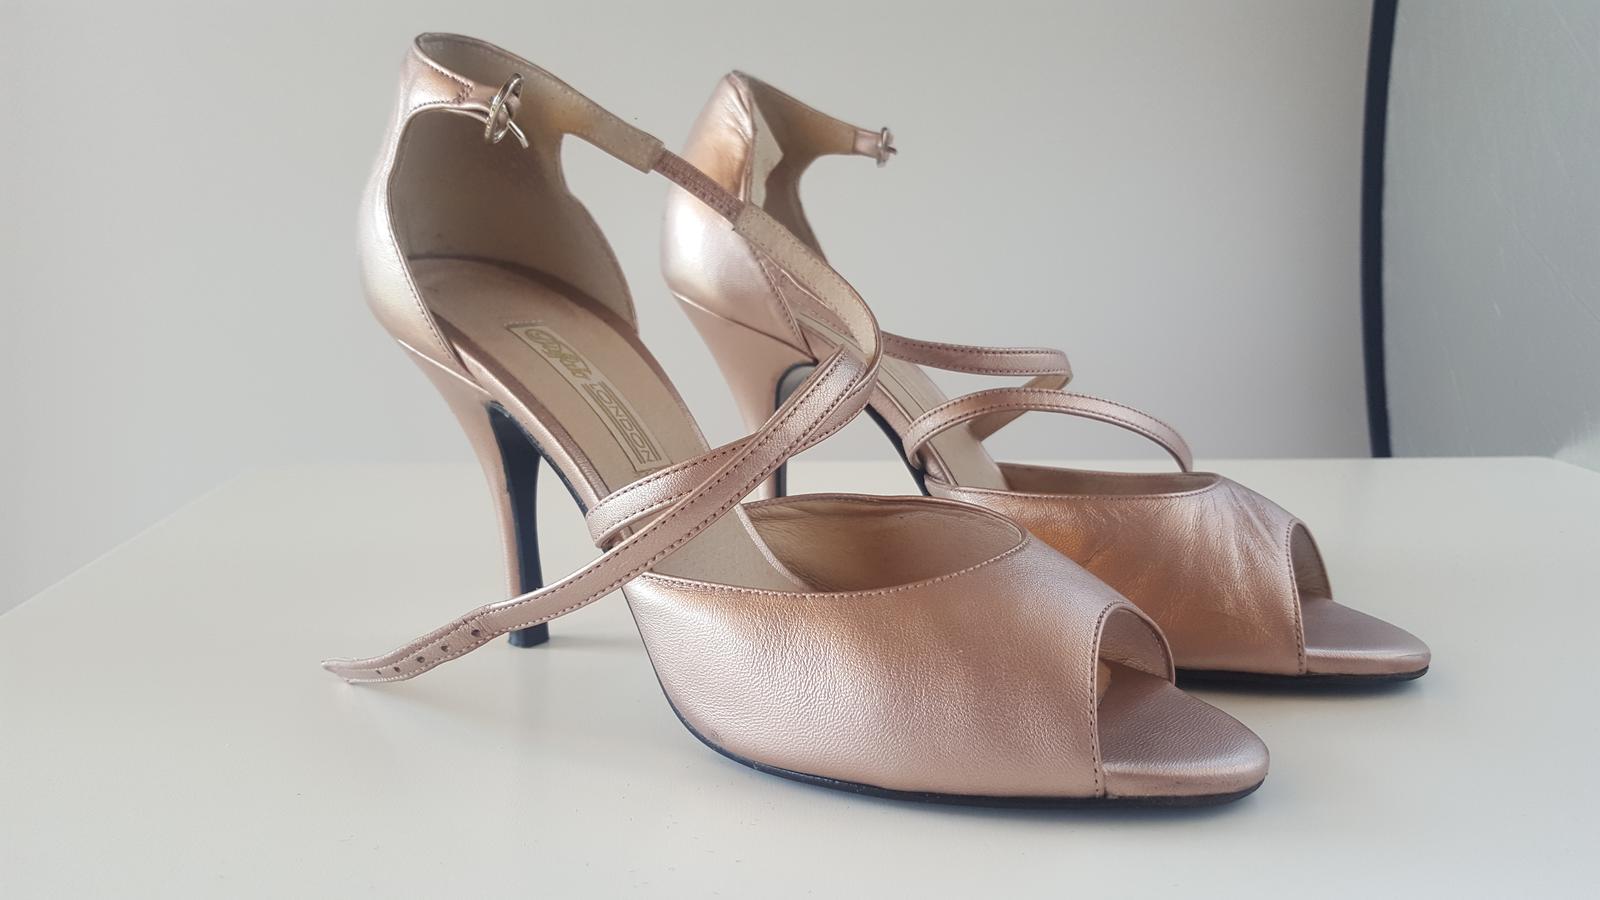 Luxusné spoločenské sandálky - Obrázok č. 1